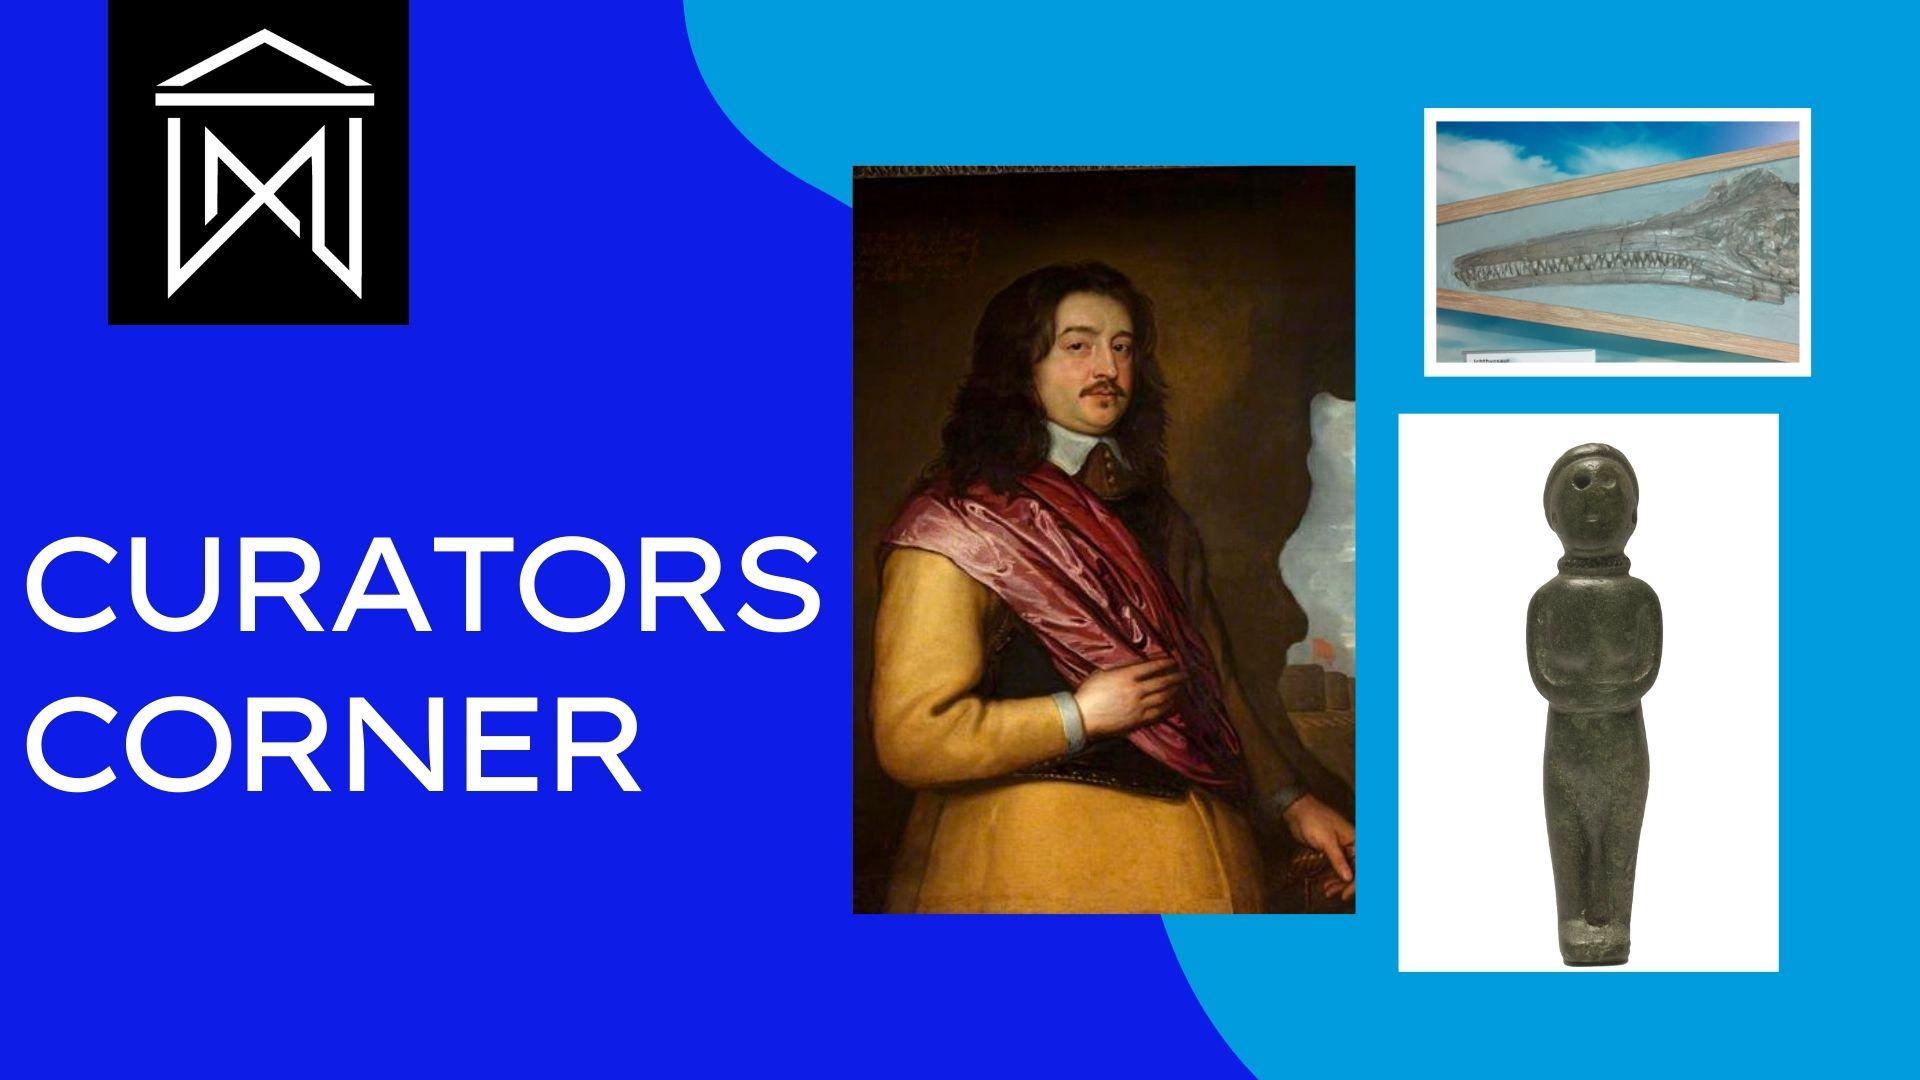 Curators Corner